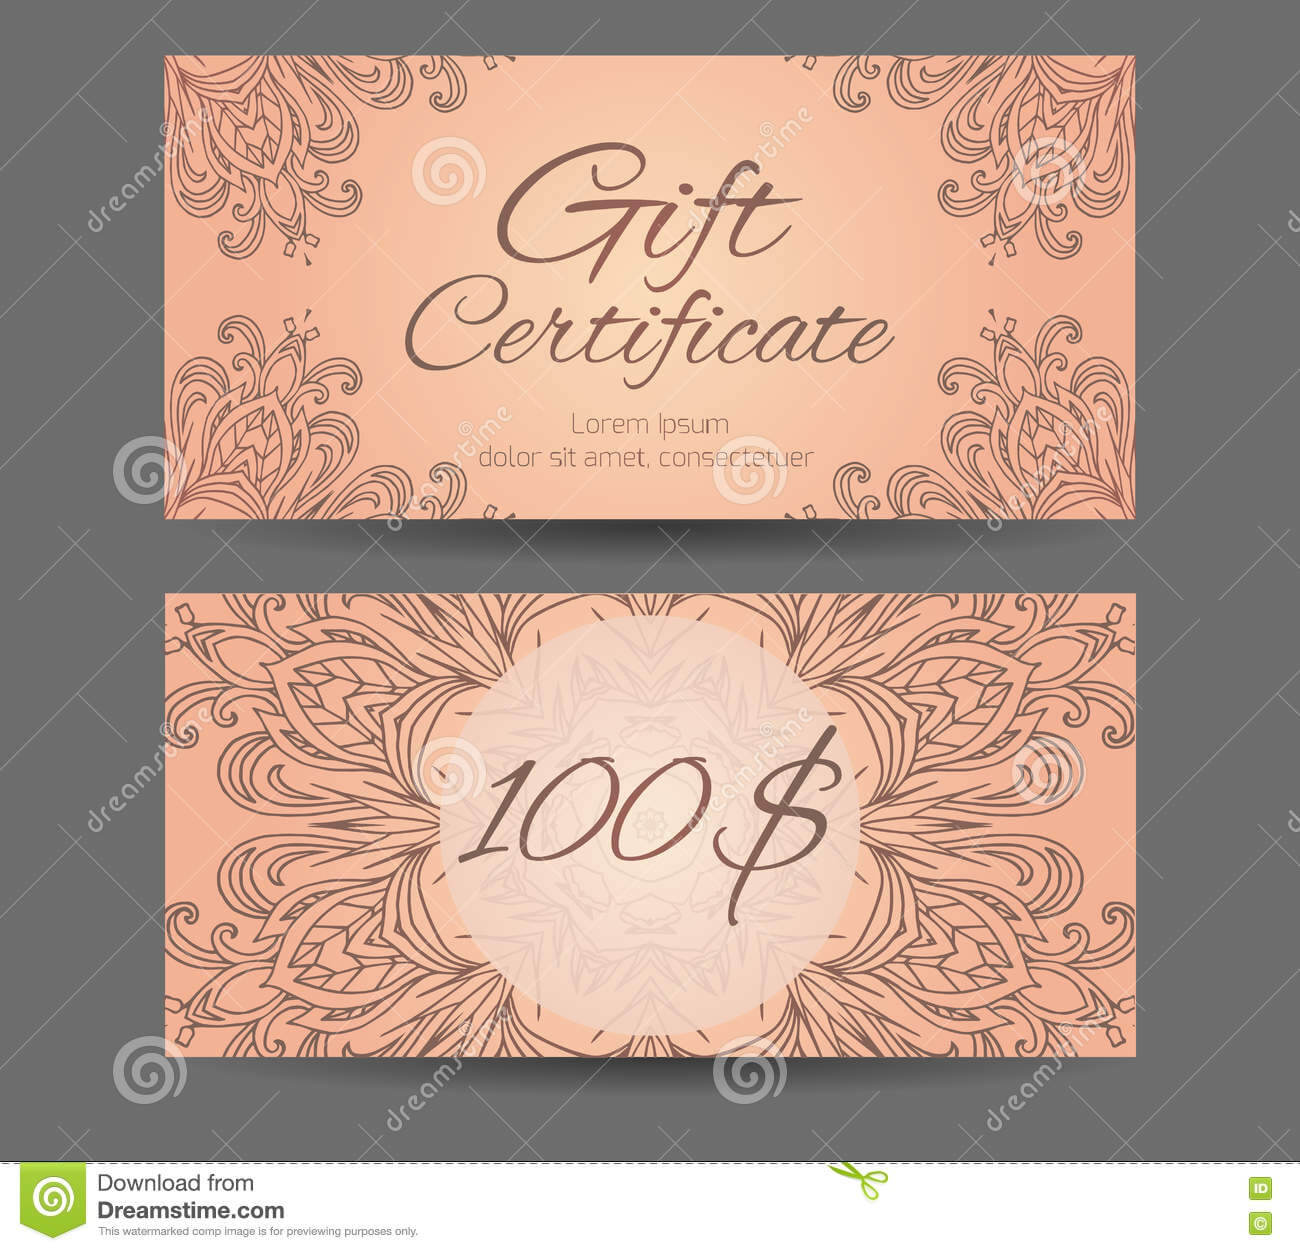 Template Gift Certificate For Yoga Studio, Spa Center Within Yoga Gift Certificate Template Free